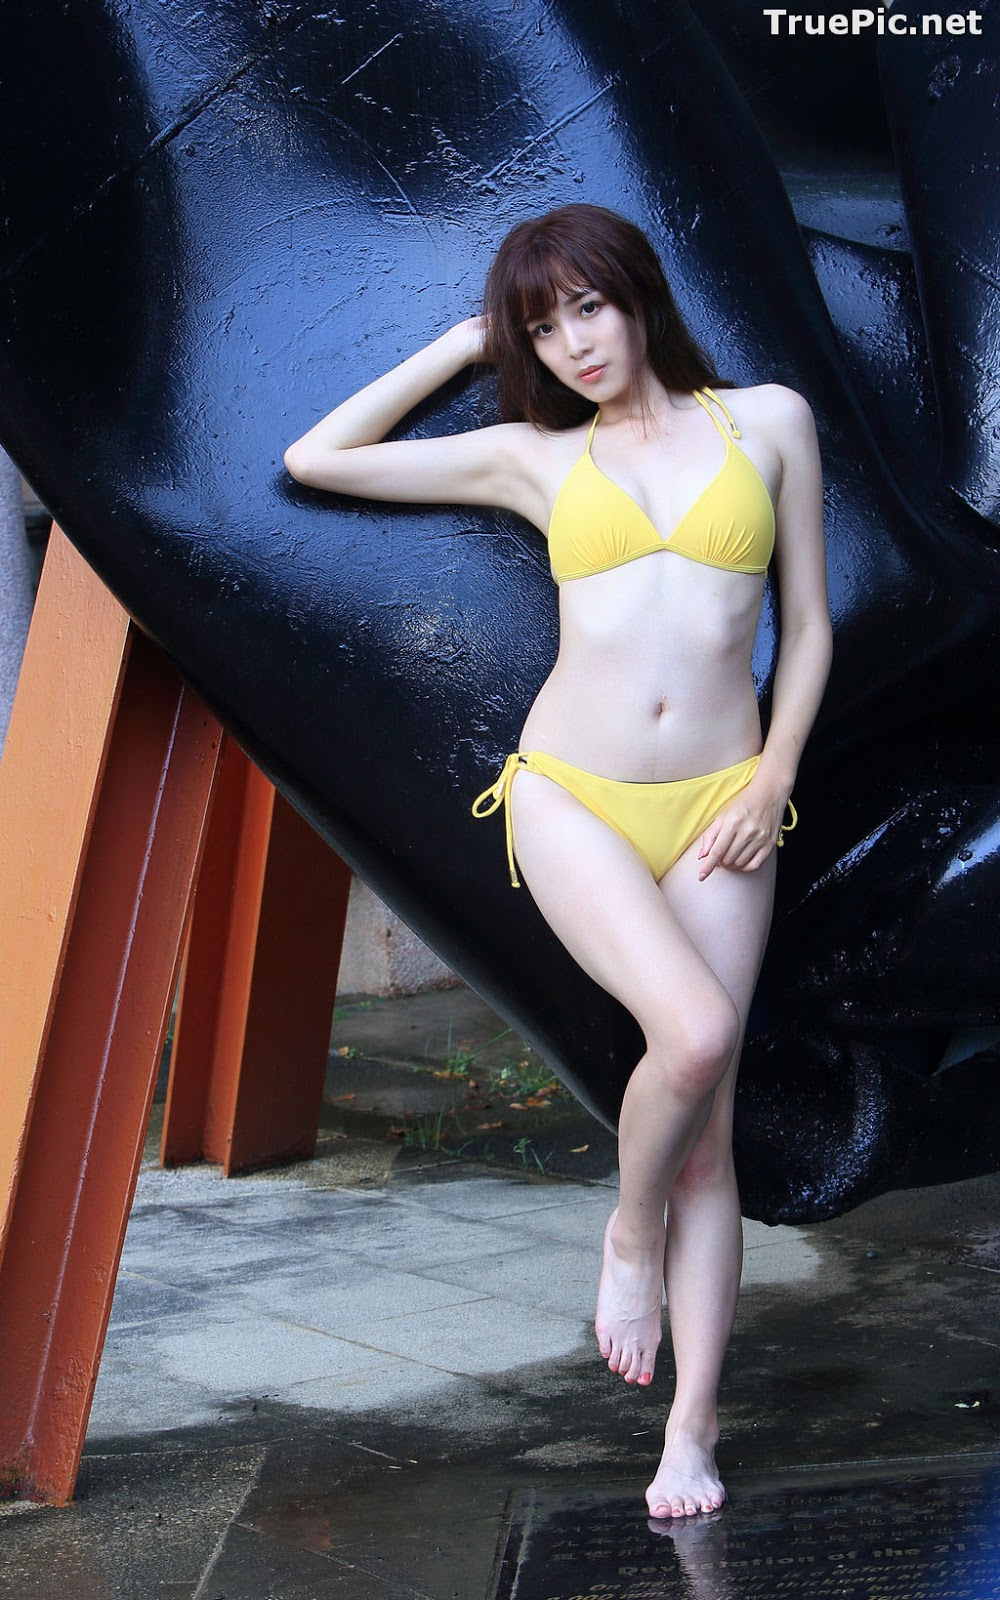 Image Taiwanese Model - Ash Ley - Yellow Bikini at Taipei Water Museum - TruePic.net - Picture-72